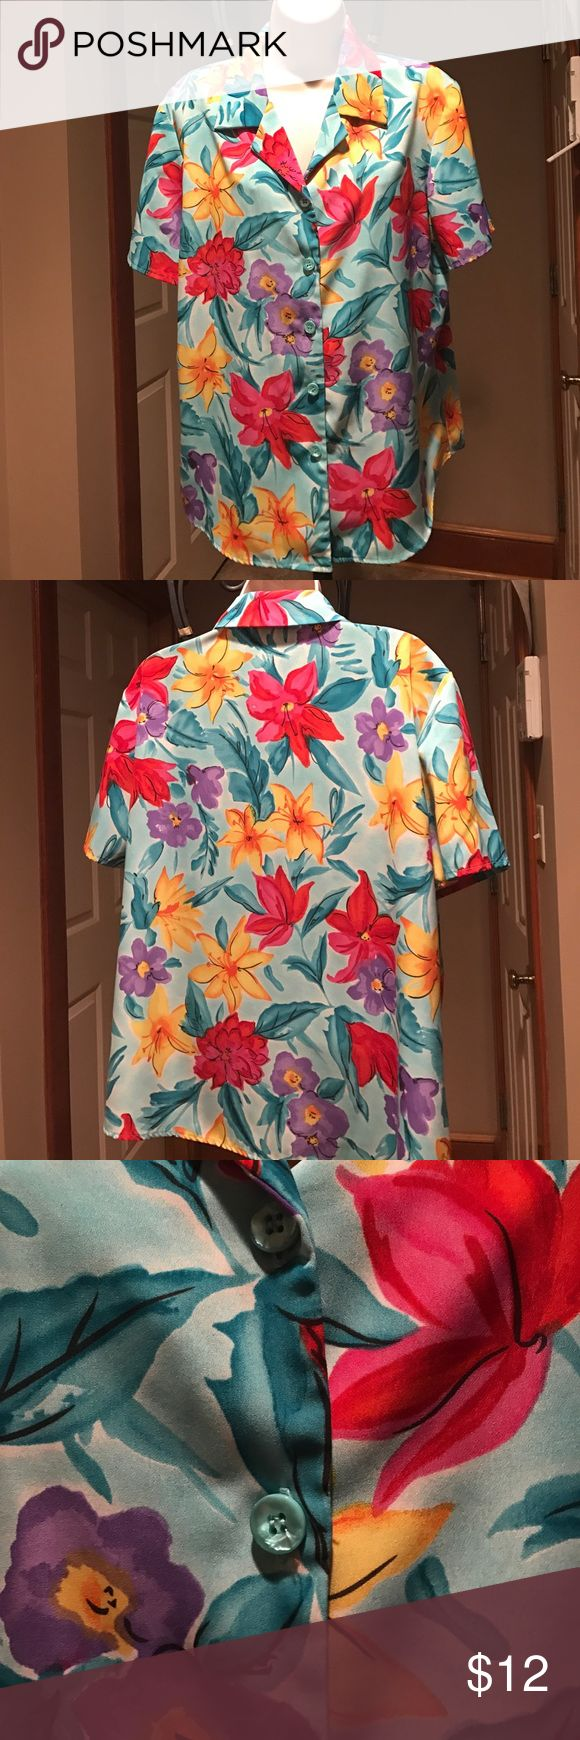 QVC Susan Graver blouse Susan Graver style blouse. 100% polyester. Made in USA. Machine wash. Susan Graver Tops Blouses